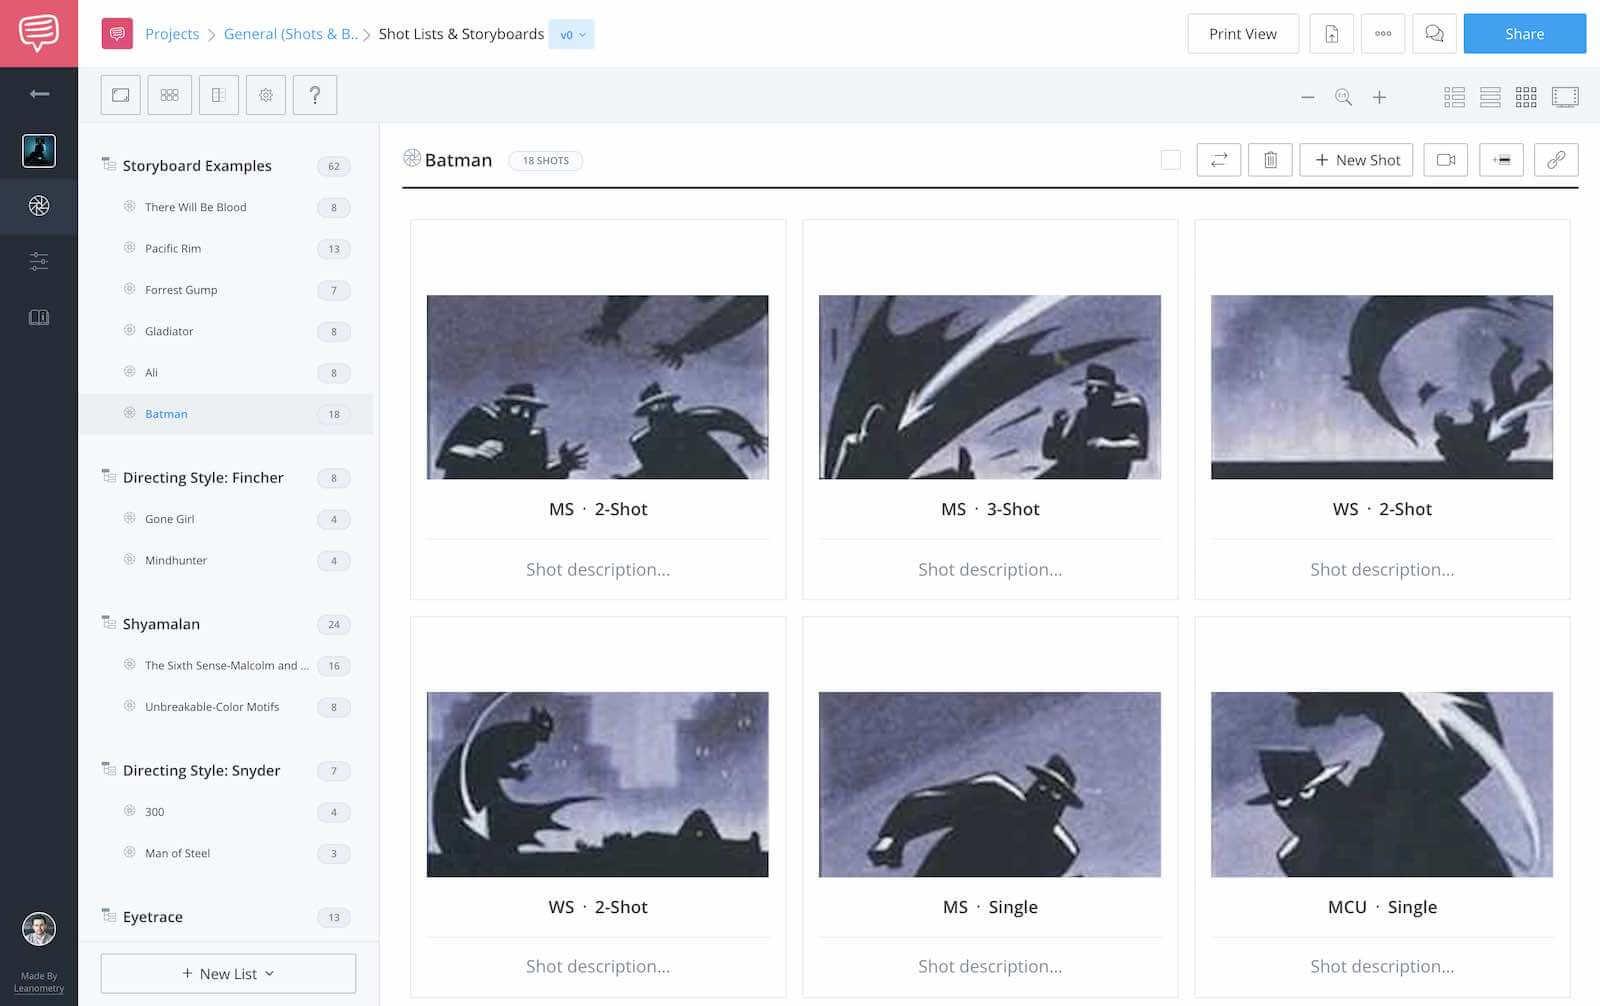 Storyboard Examples - Batman Storyboard Complete - StudioBinder